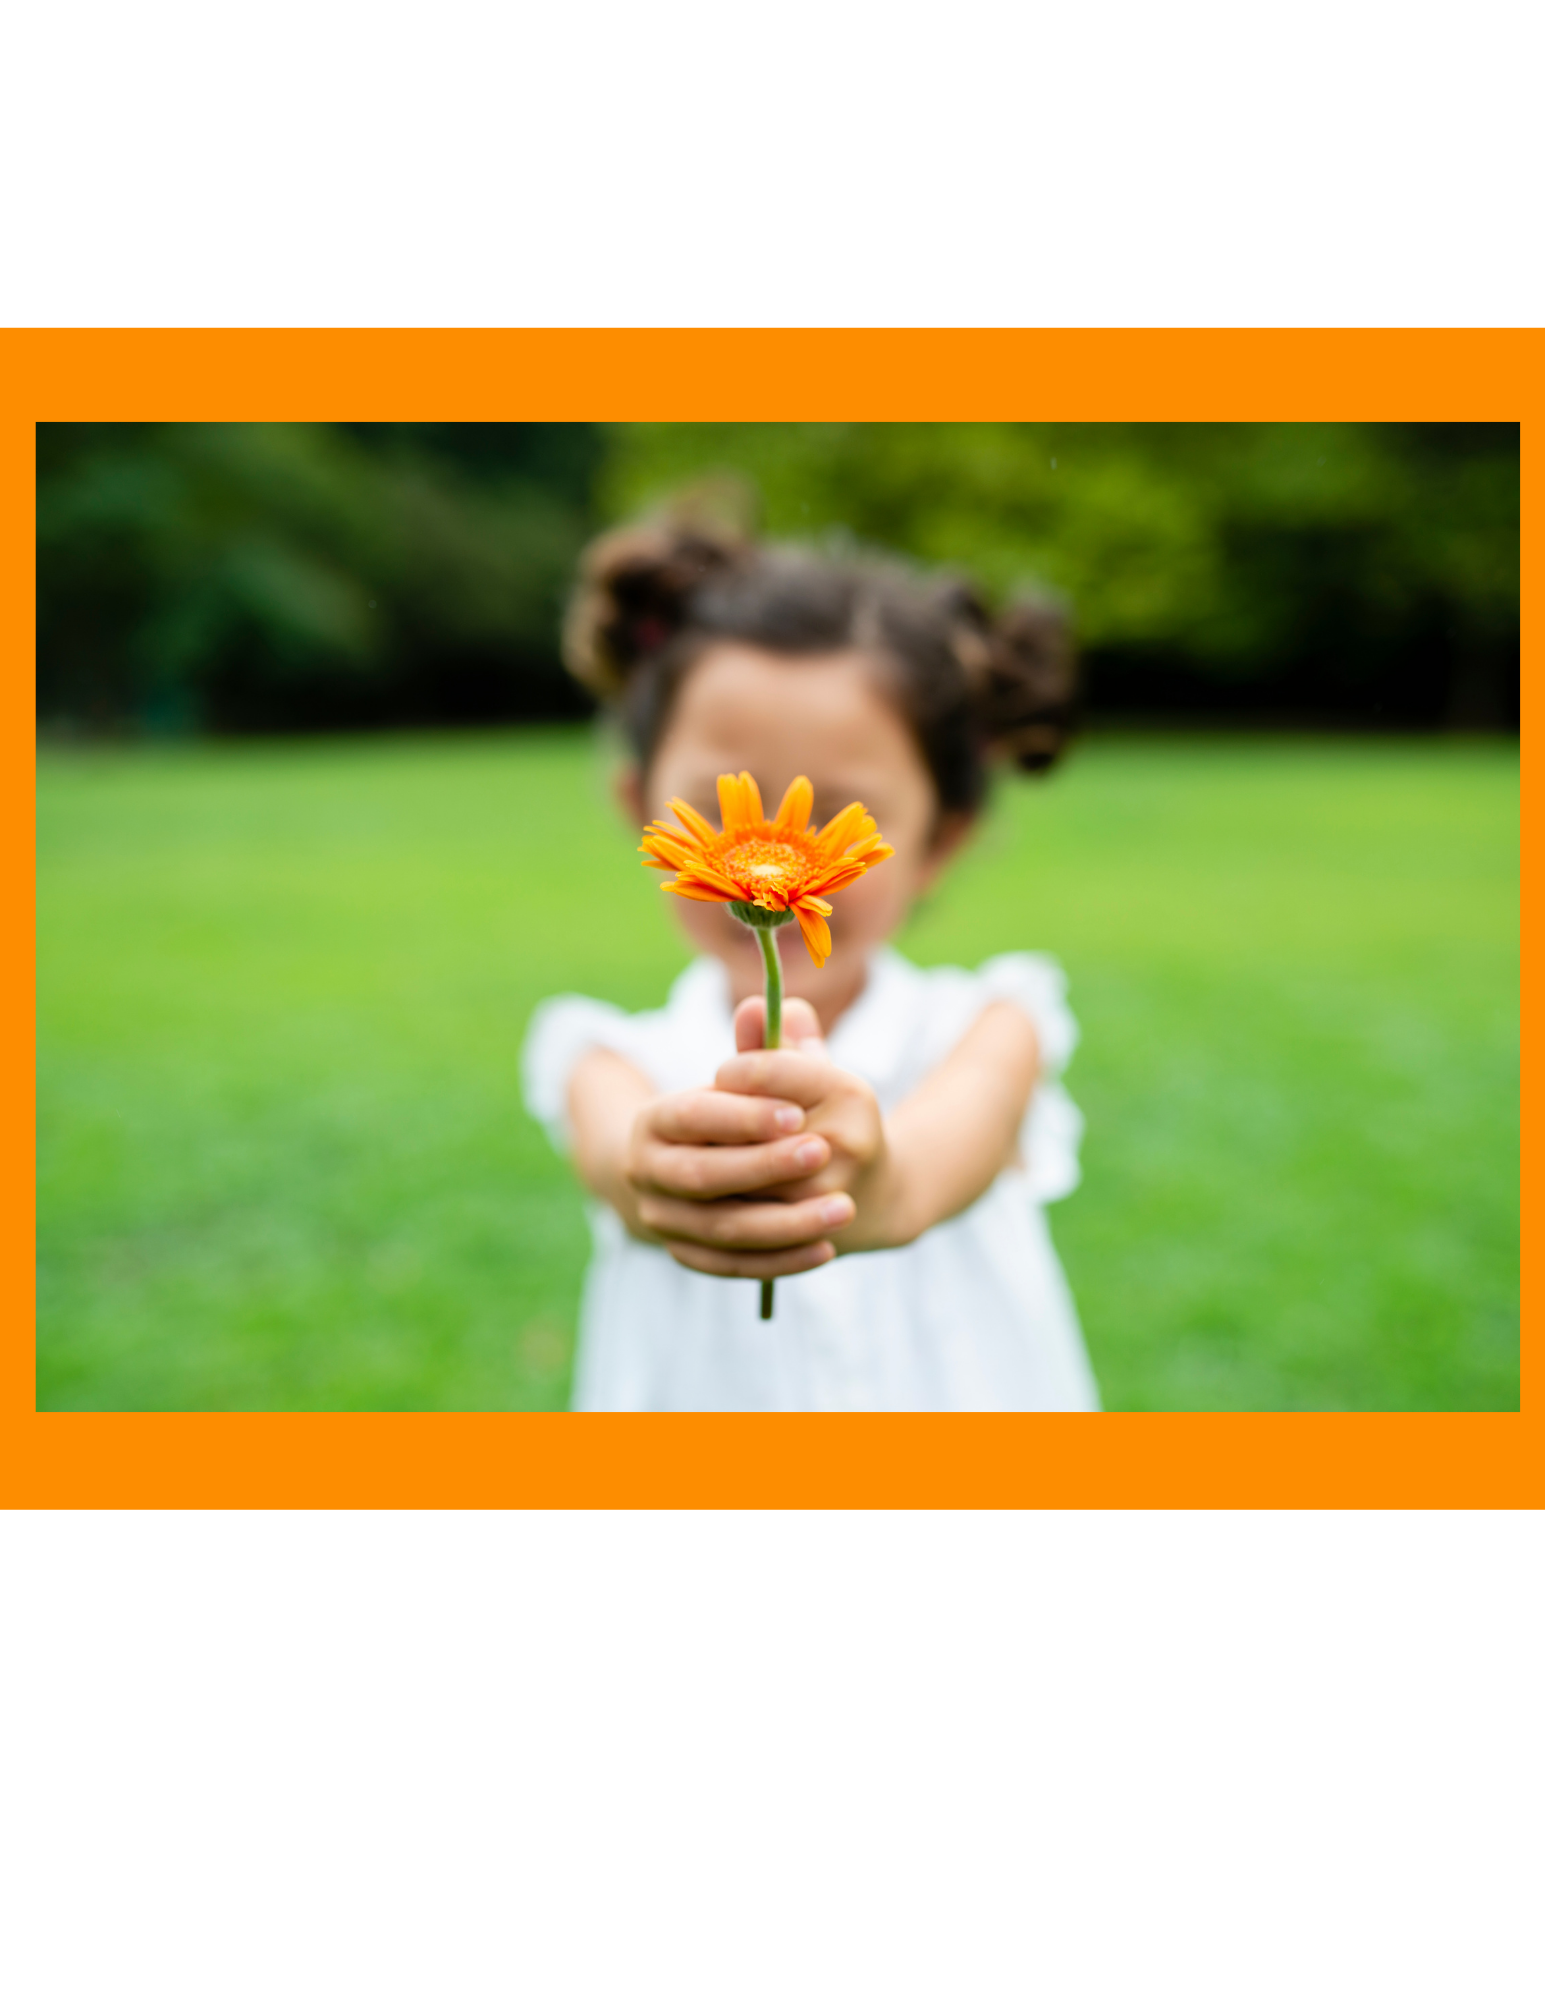 A little girl giving an orange flower.